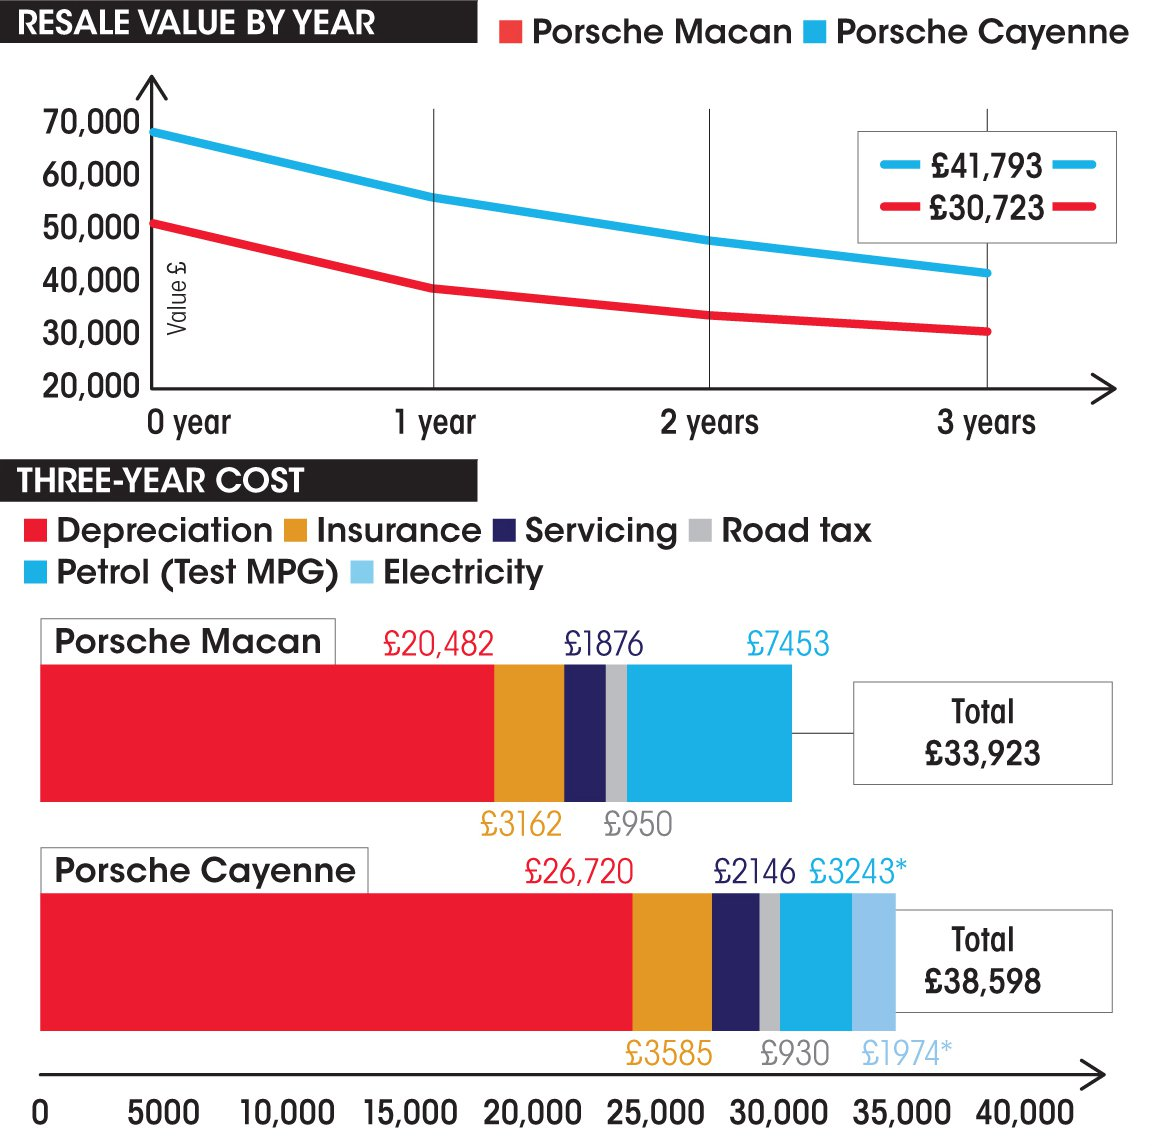 Porsche Macan vs Porsche Cayenne costs panel